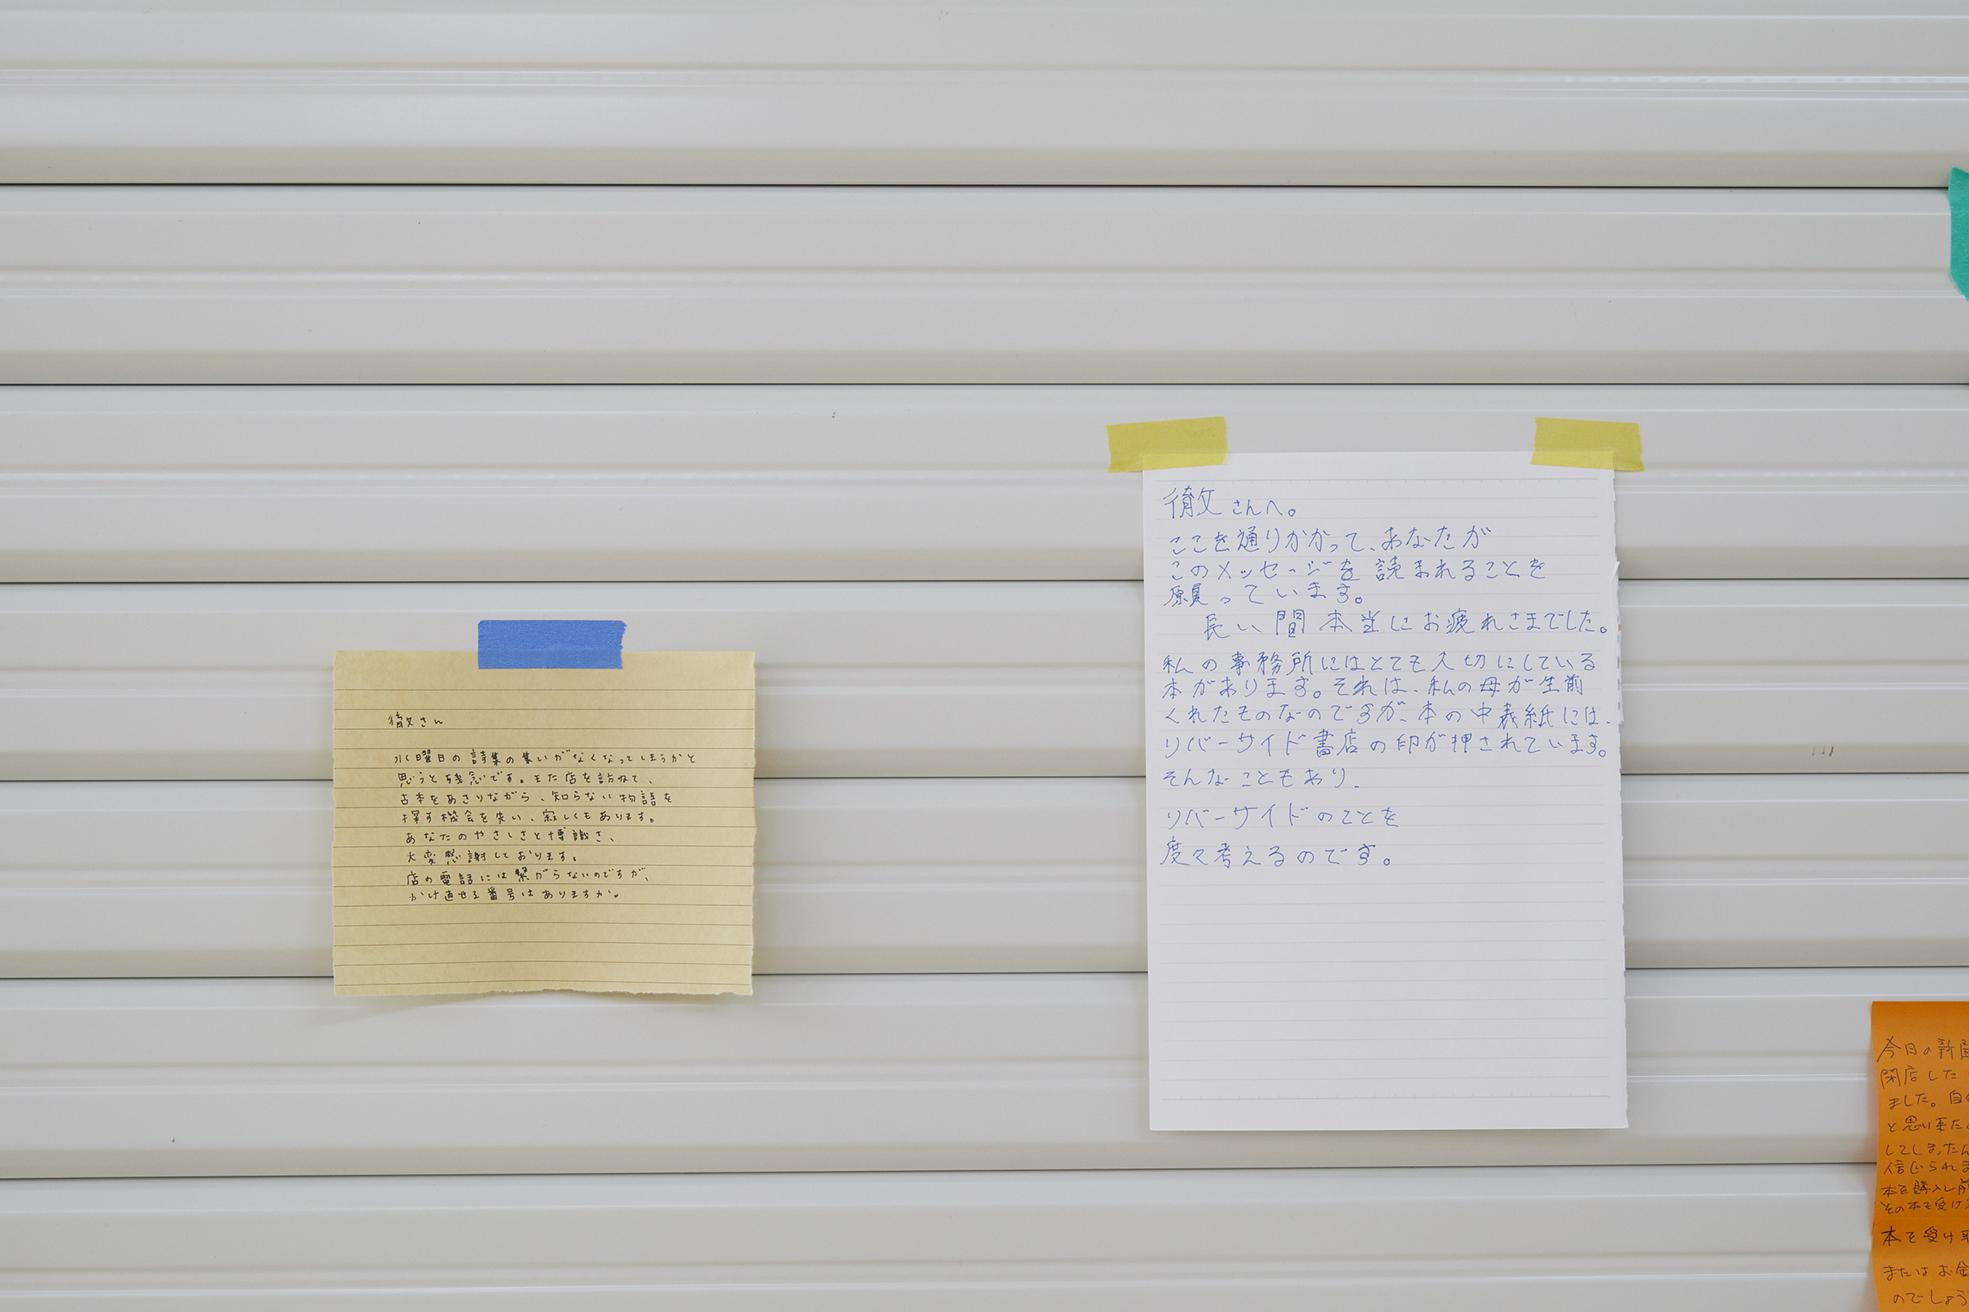 Elisa Caldana, Shutterstreet (Tokyo), detail, 2019